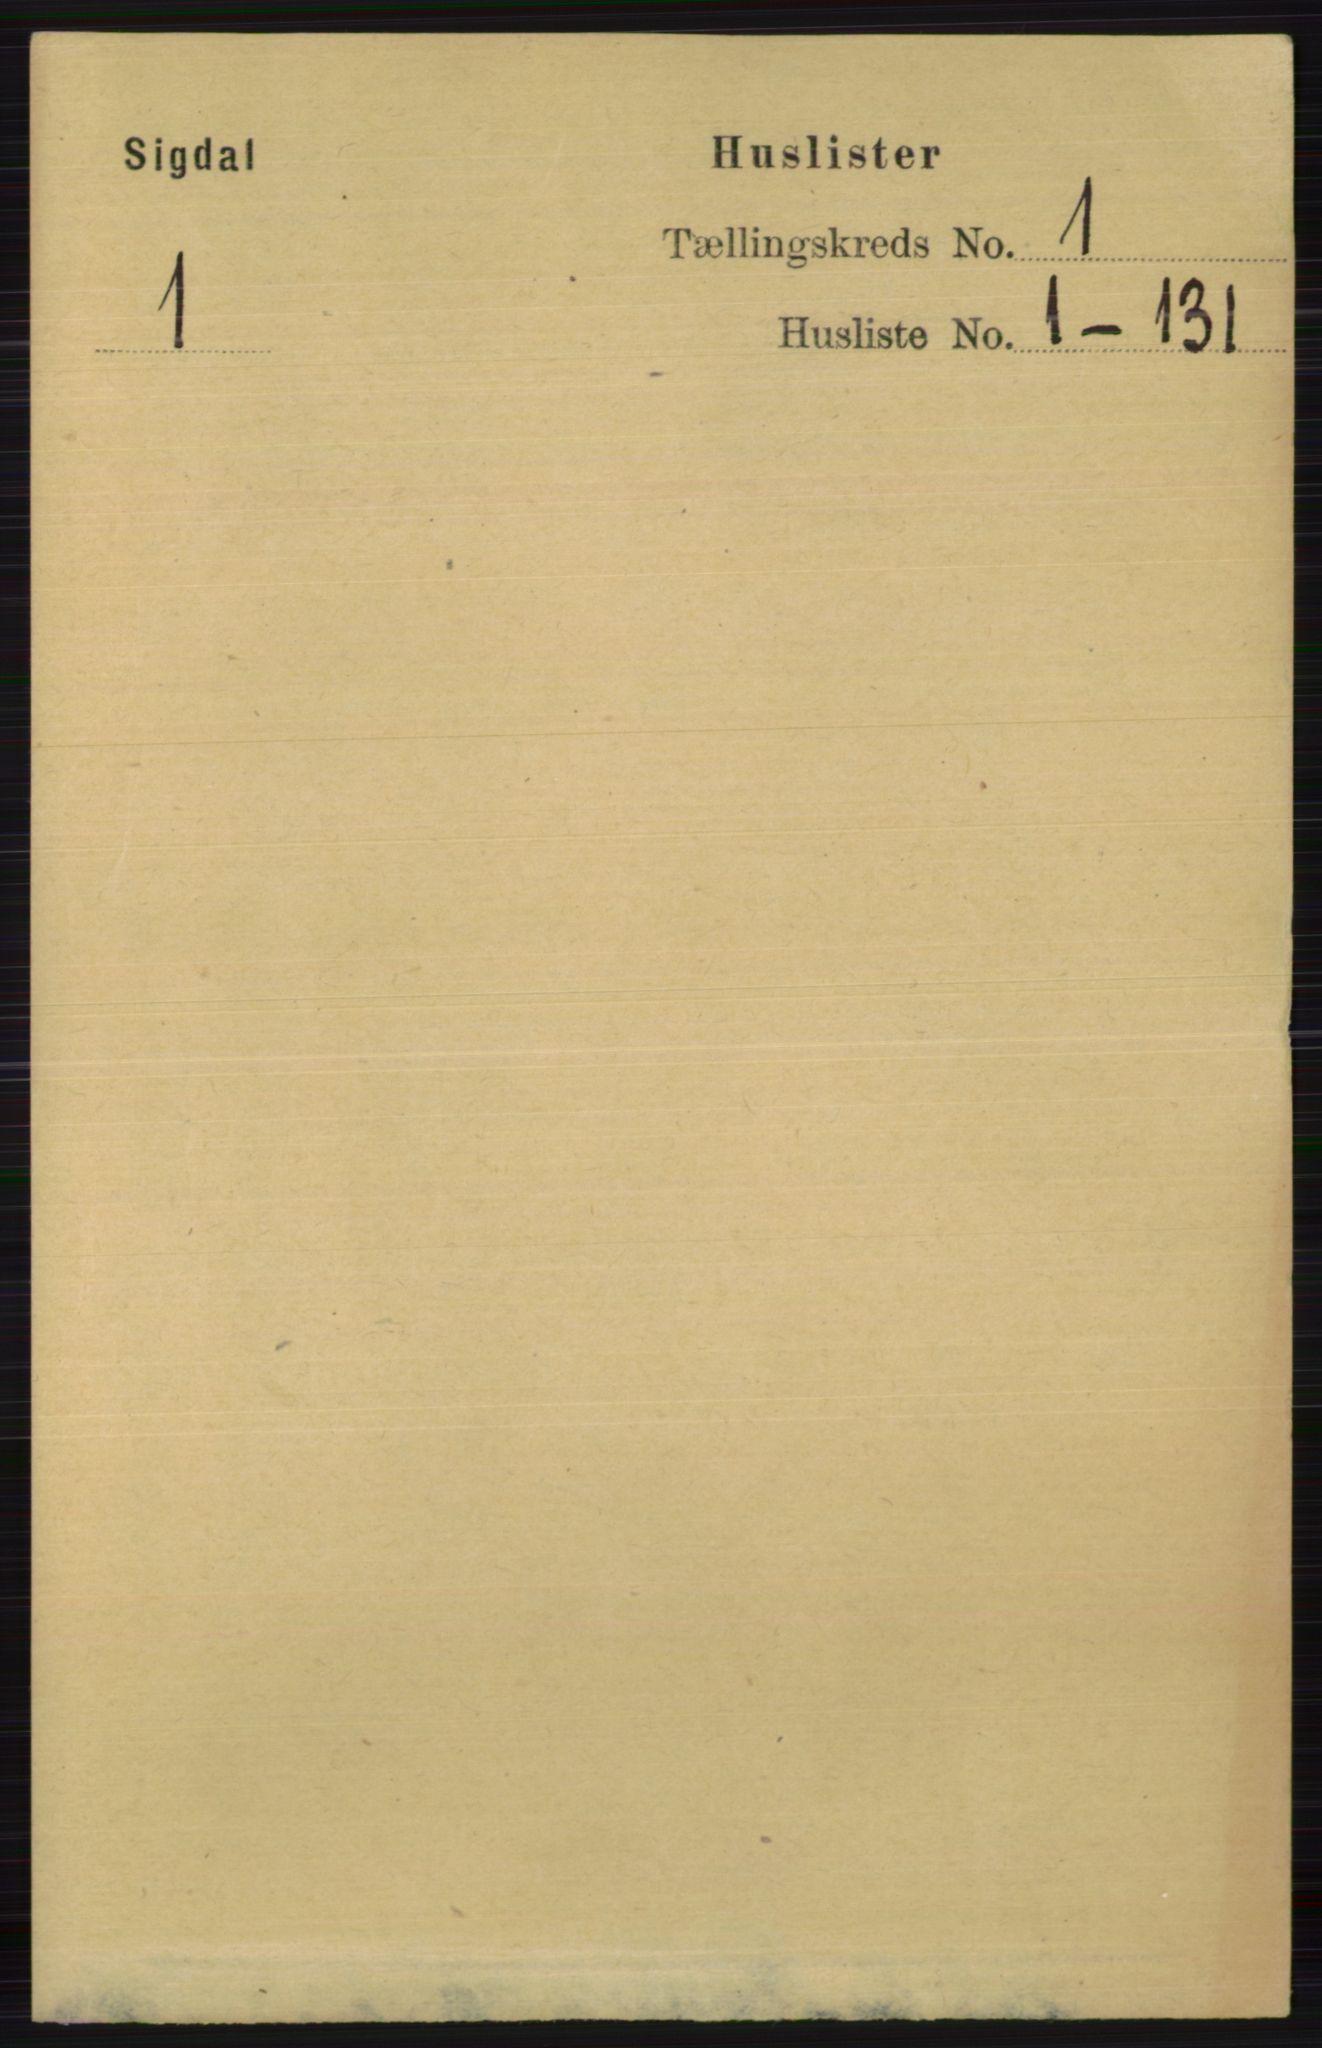 RA, Folketelling 1891 for 0621 Sigdal herred, 1891, s. 53